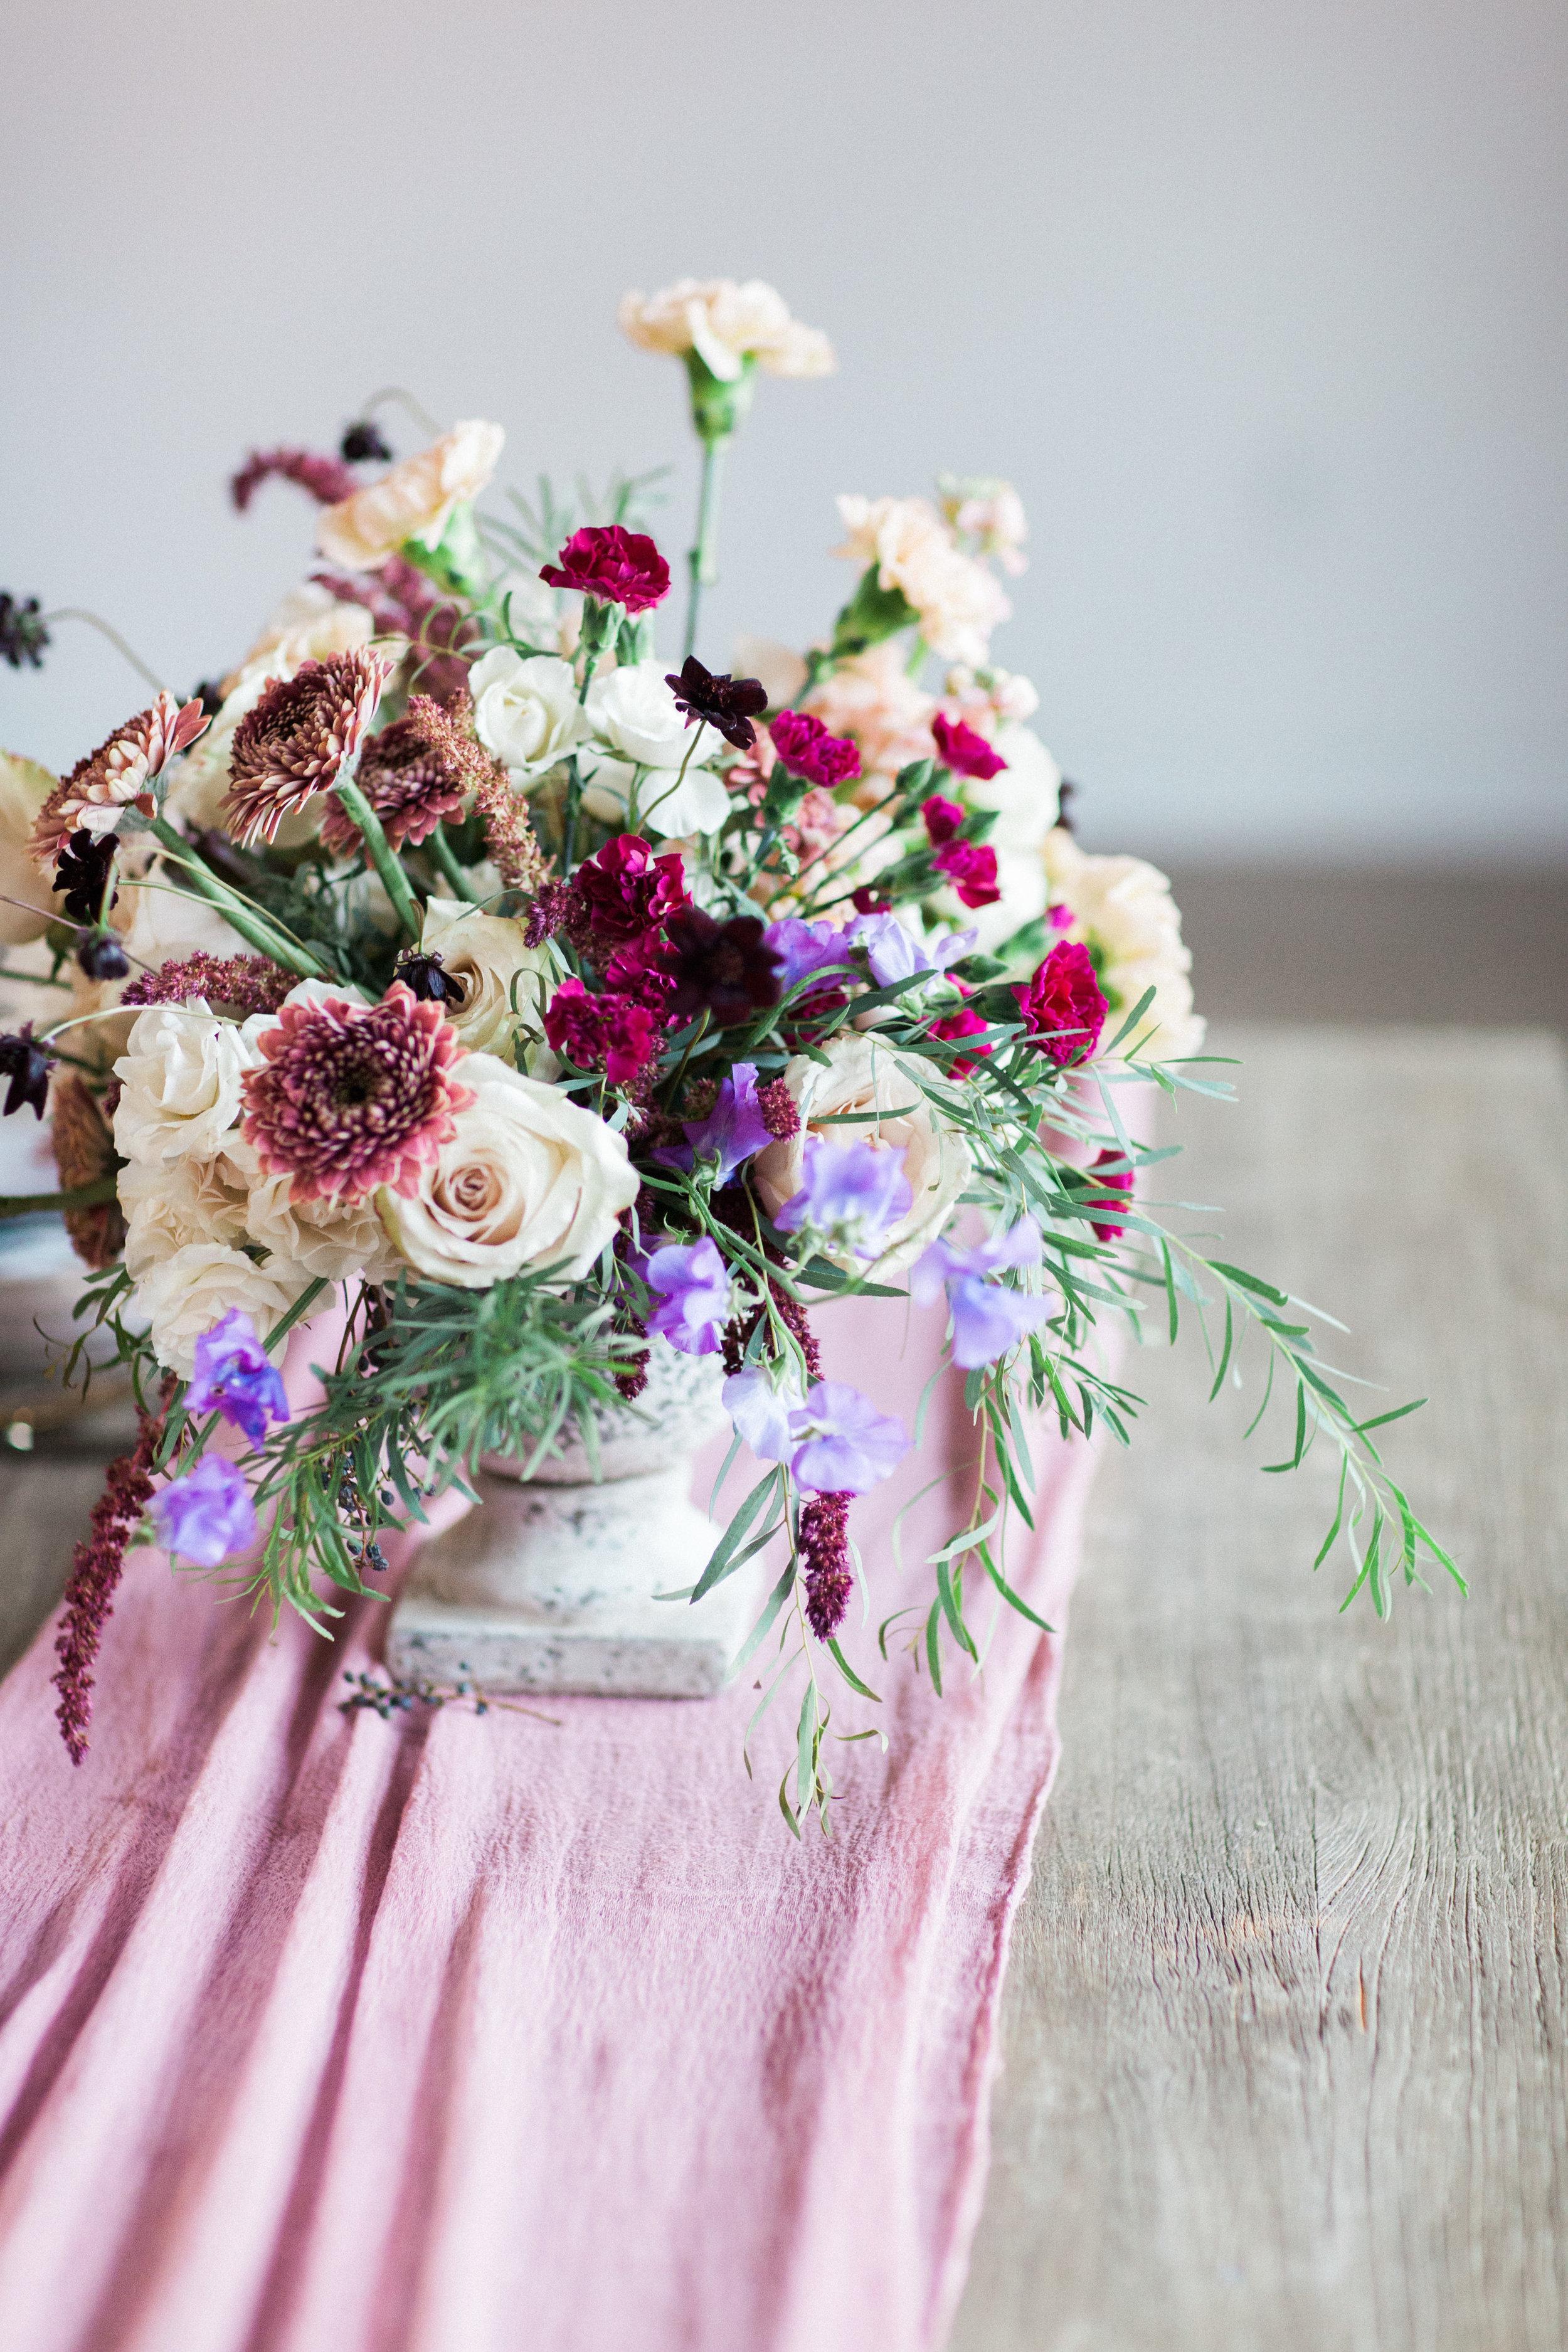 Mauve and Lavender Modern Wedding Inspiration - Centerpiece